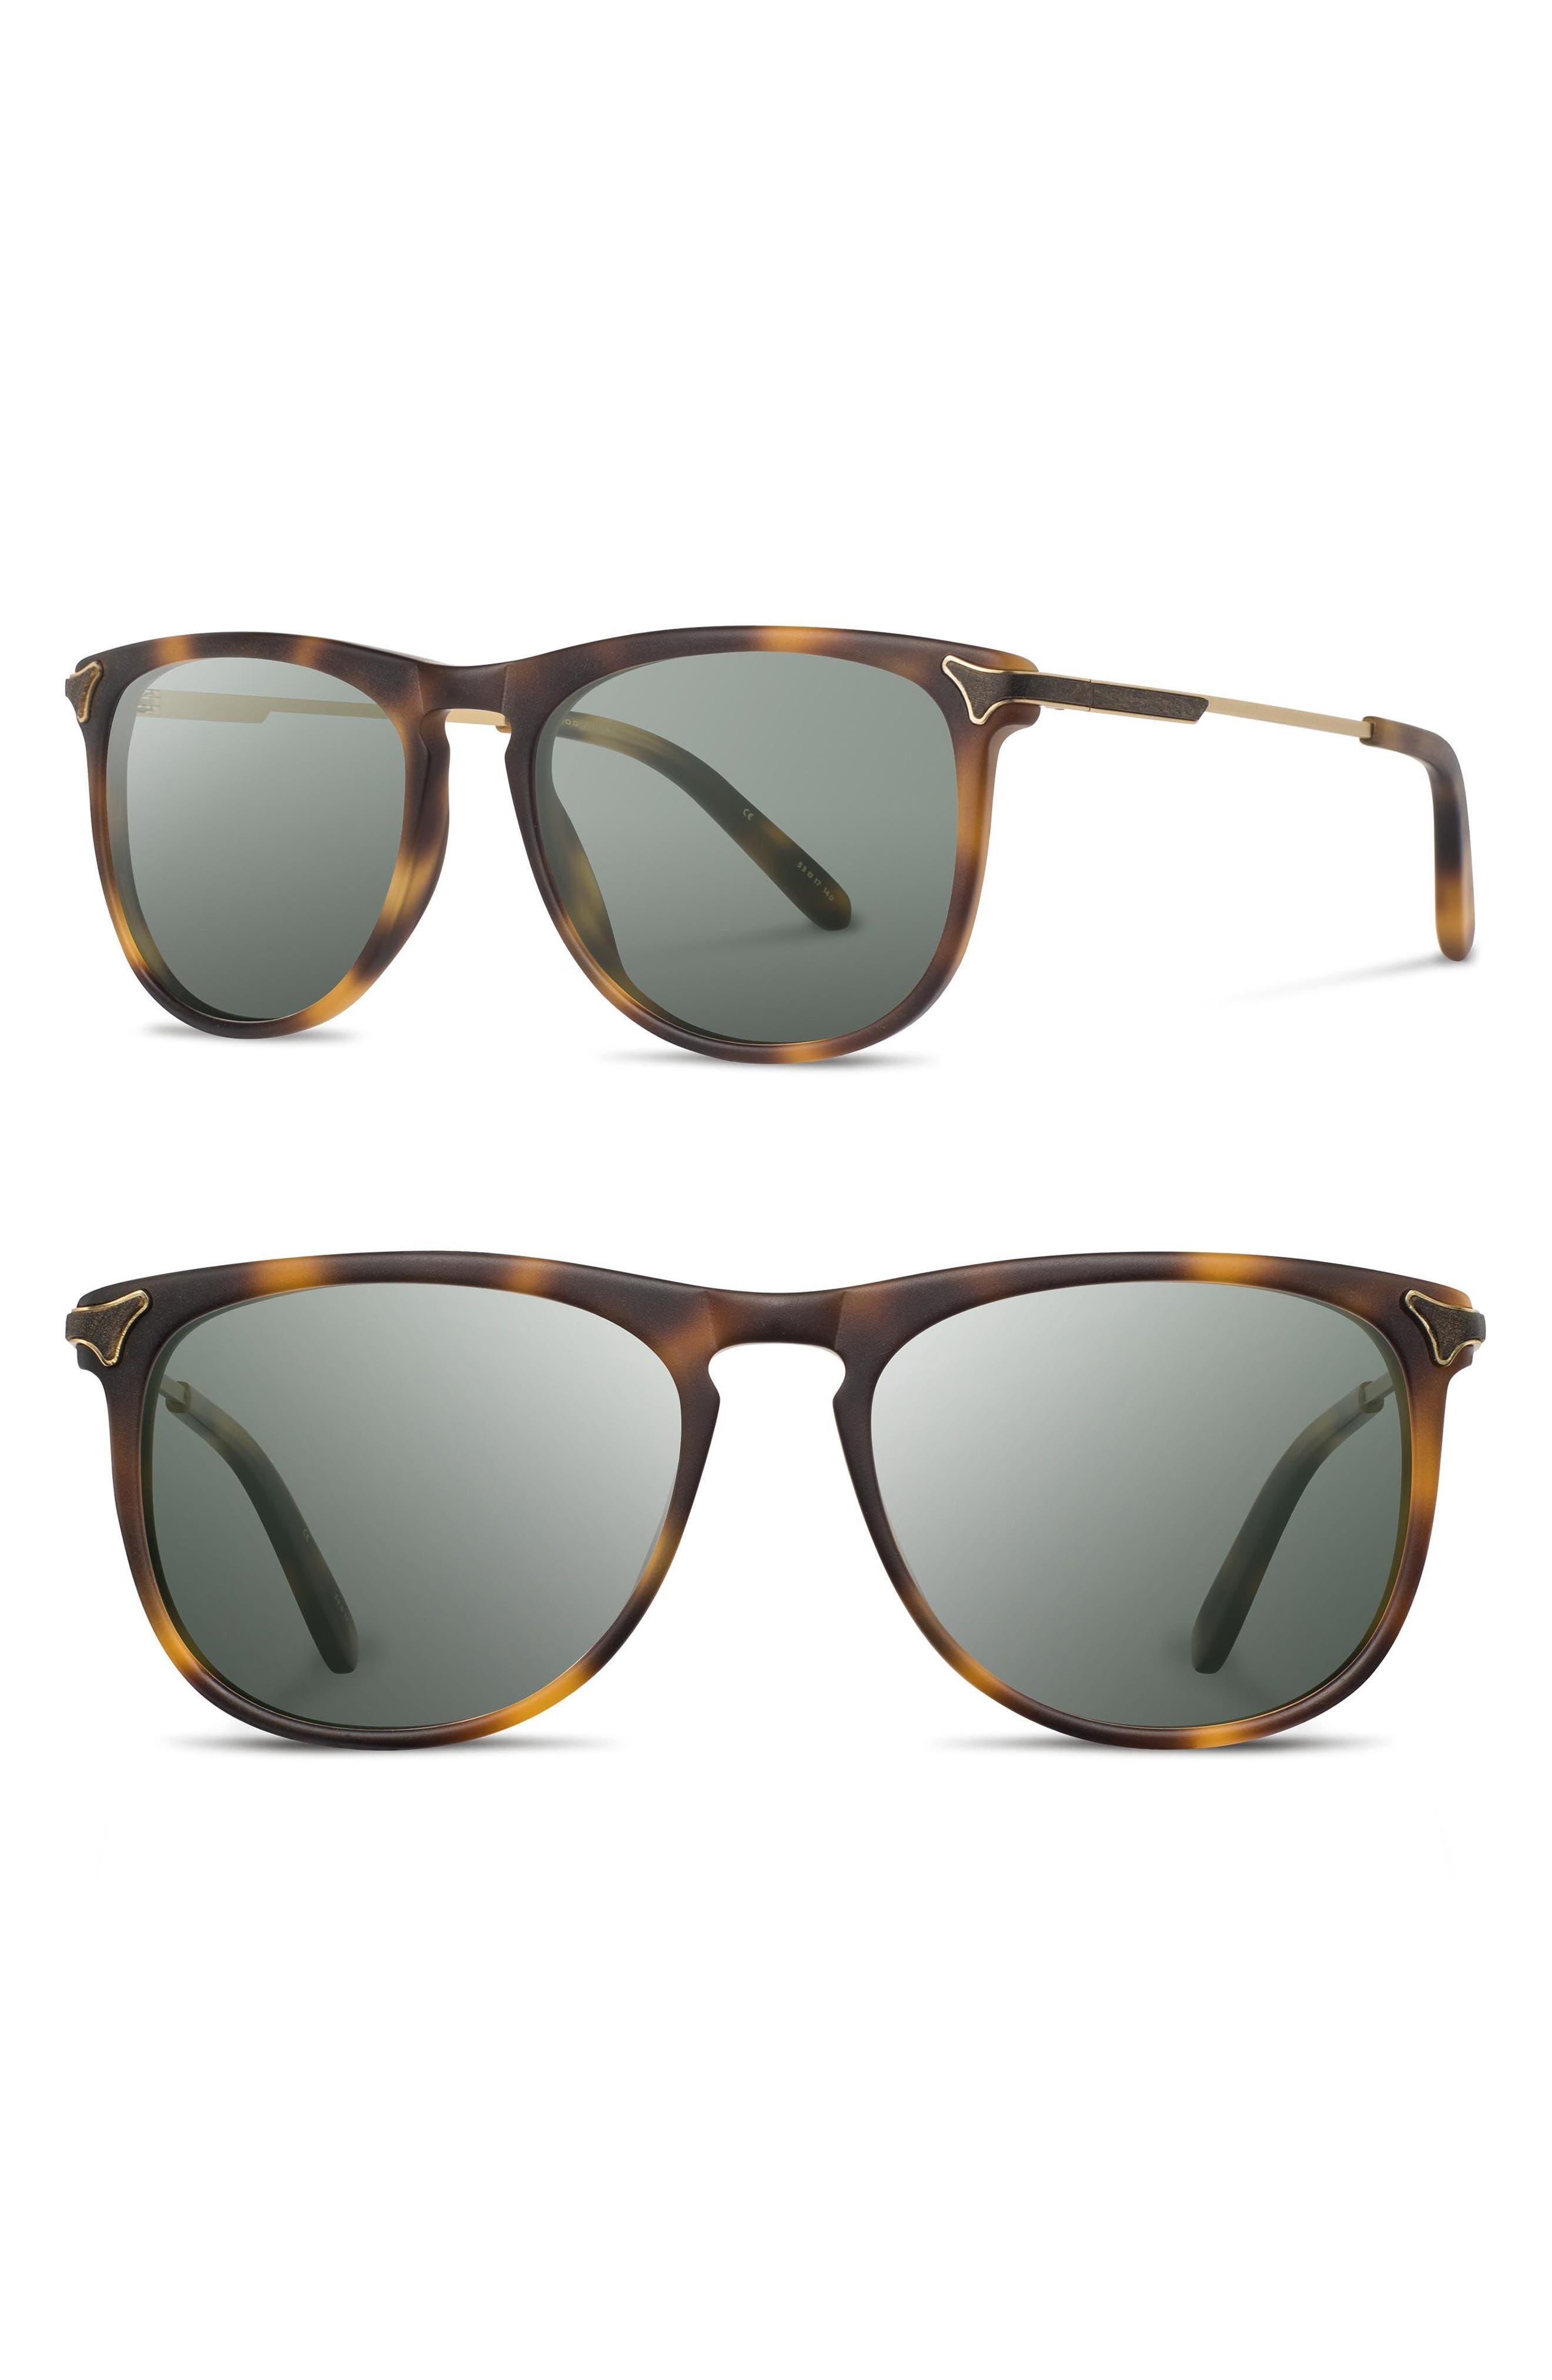 Main Image - Shwood Keller 53mm Sunglasses